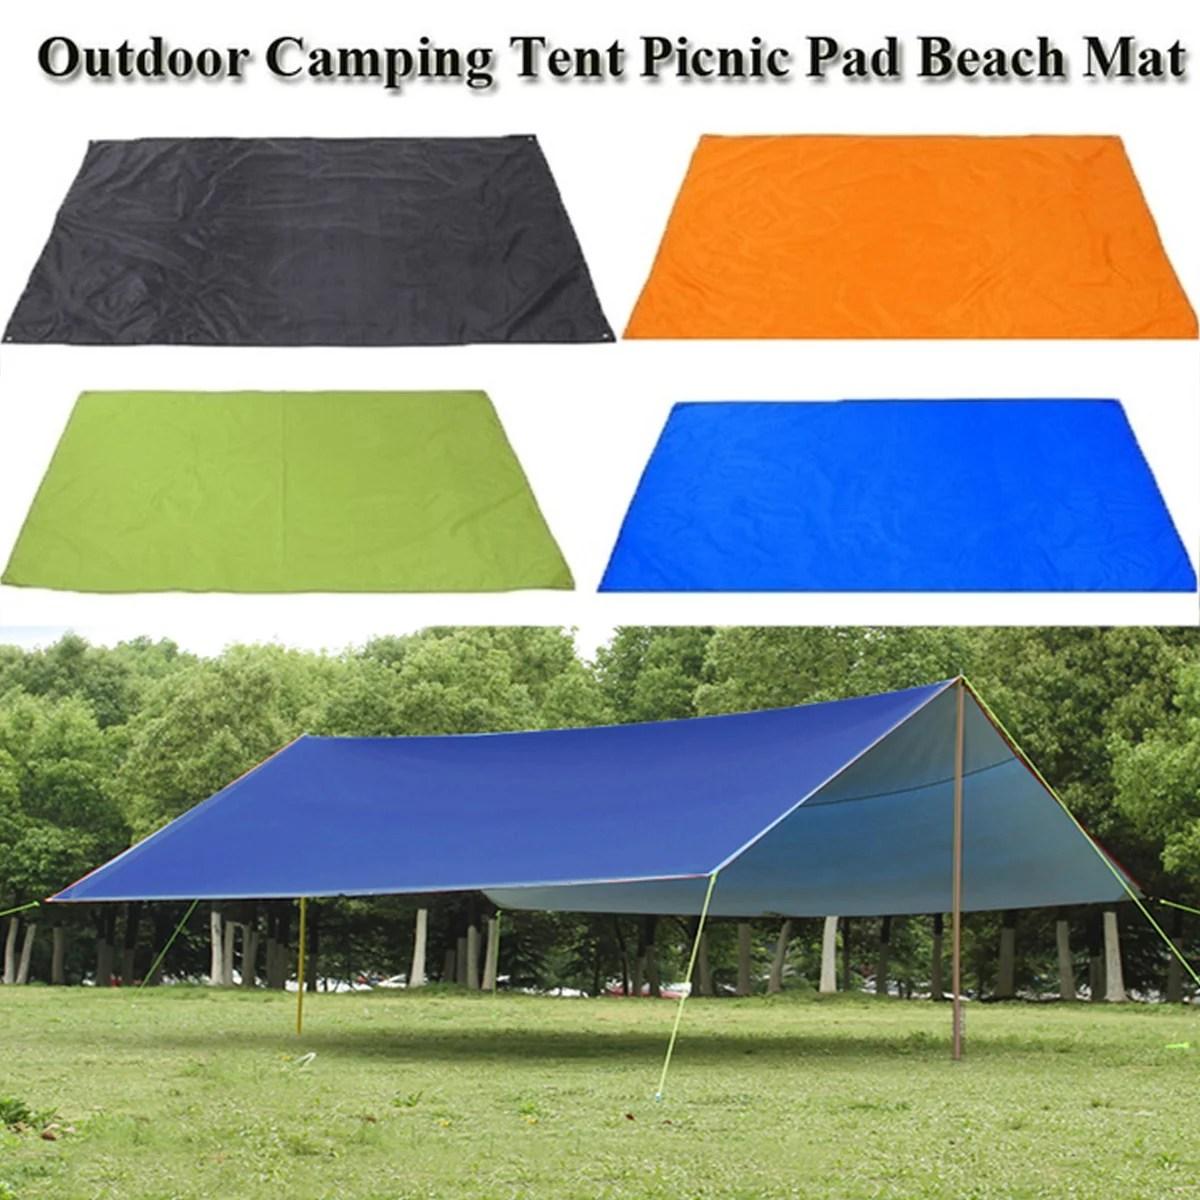 82 7 x59 rain tarp shelter waterproof canopy patio cover tent tarp awning sun shade rain shelter camping mat pad for outdoor walmart com